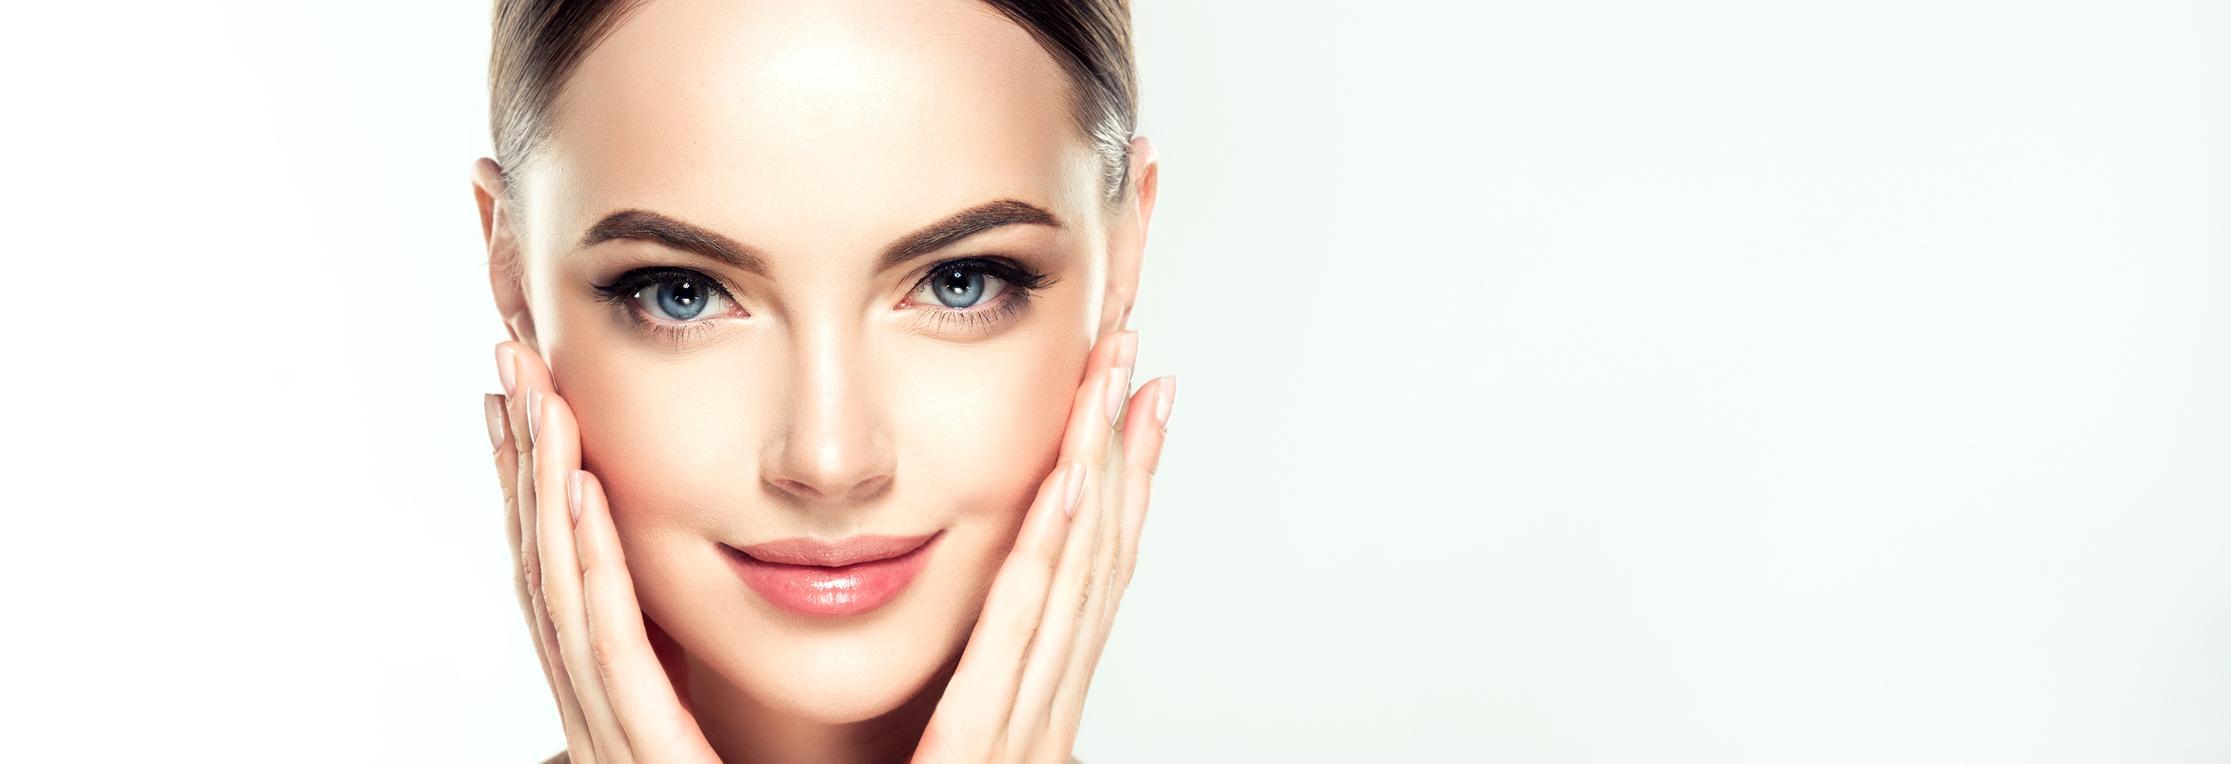 plastic surgery institute of dayton facial procedure dayton ohio